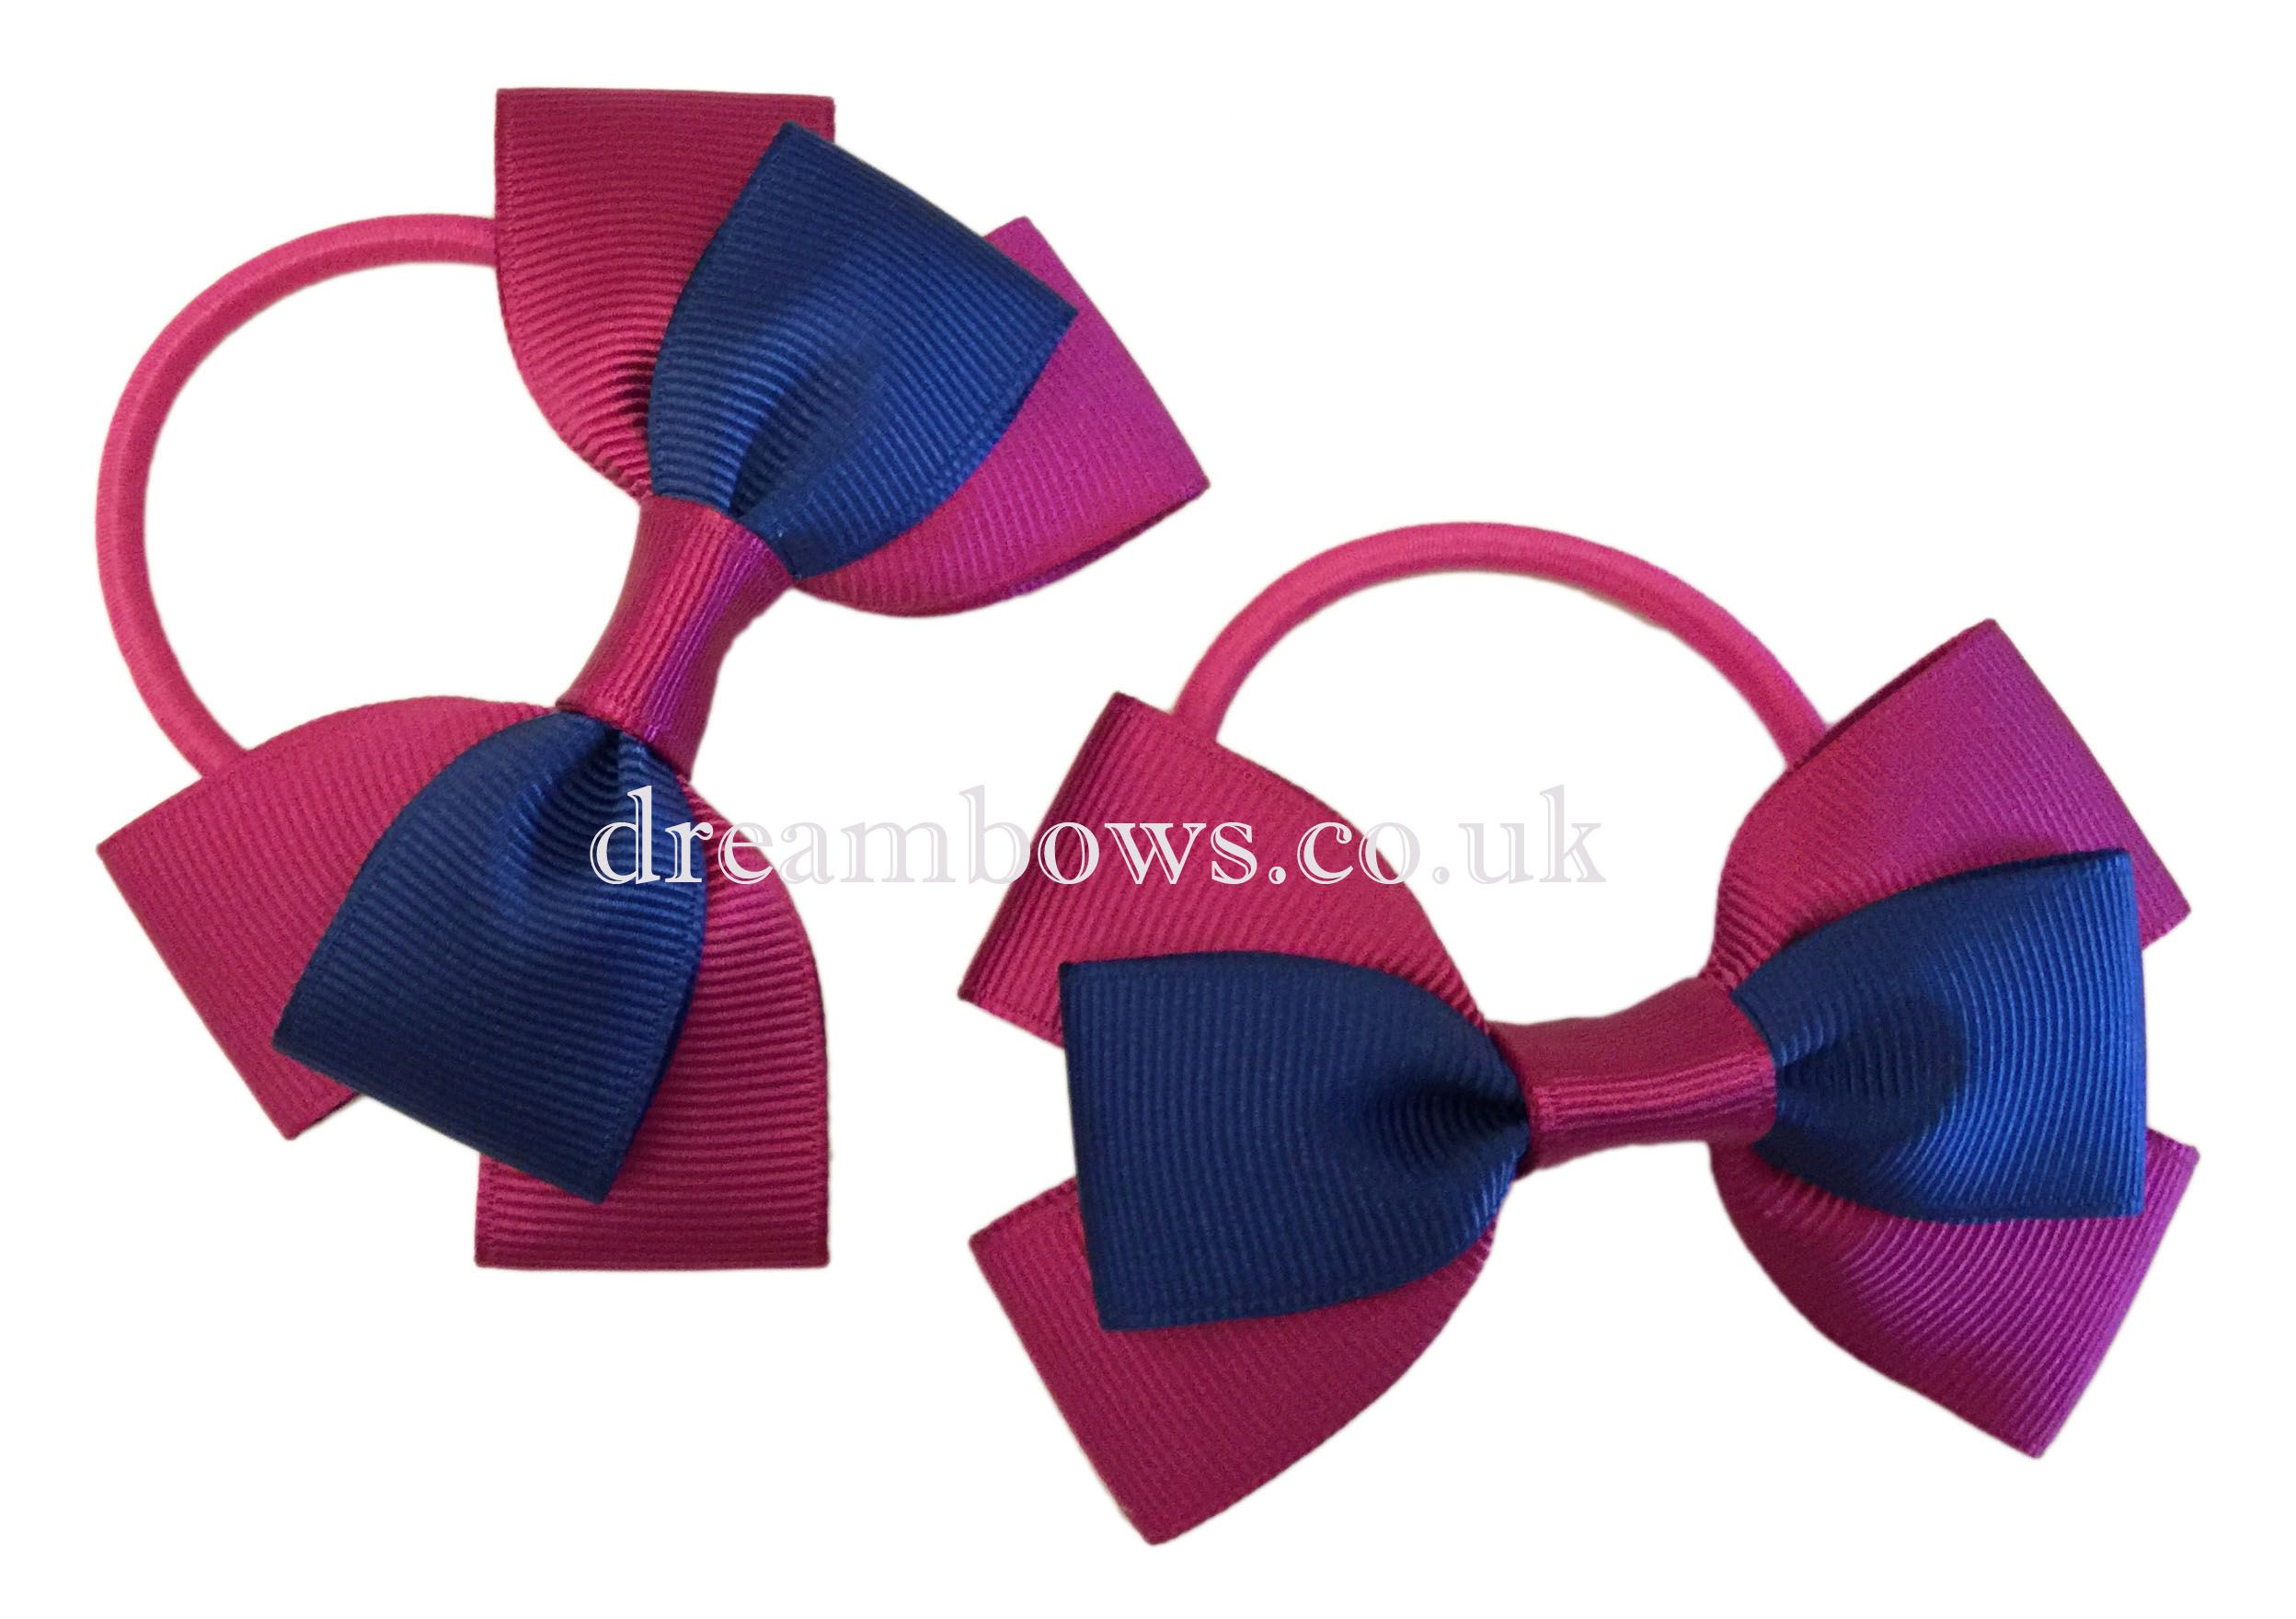 Girls grosgrain ribbon hair bows uk grosgrain bows thick bobbles